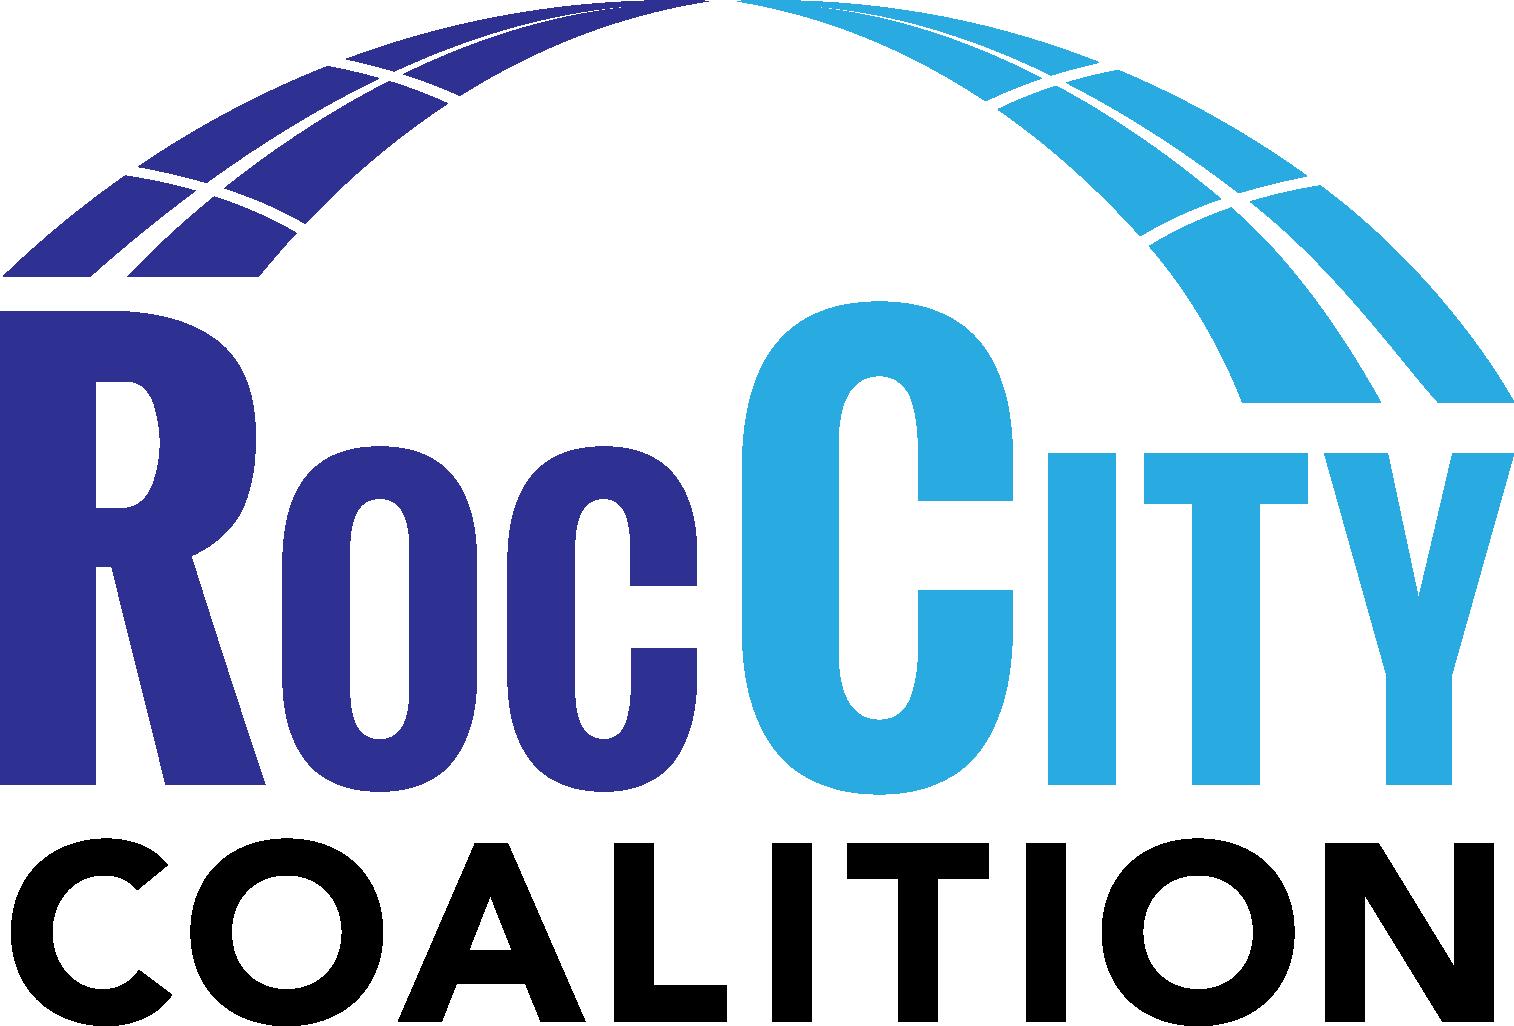 ROCCity Coalition